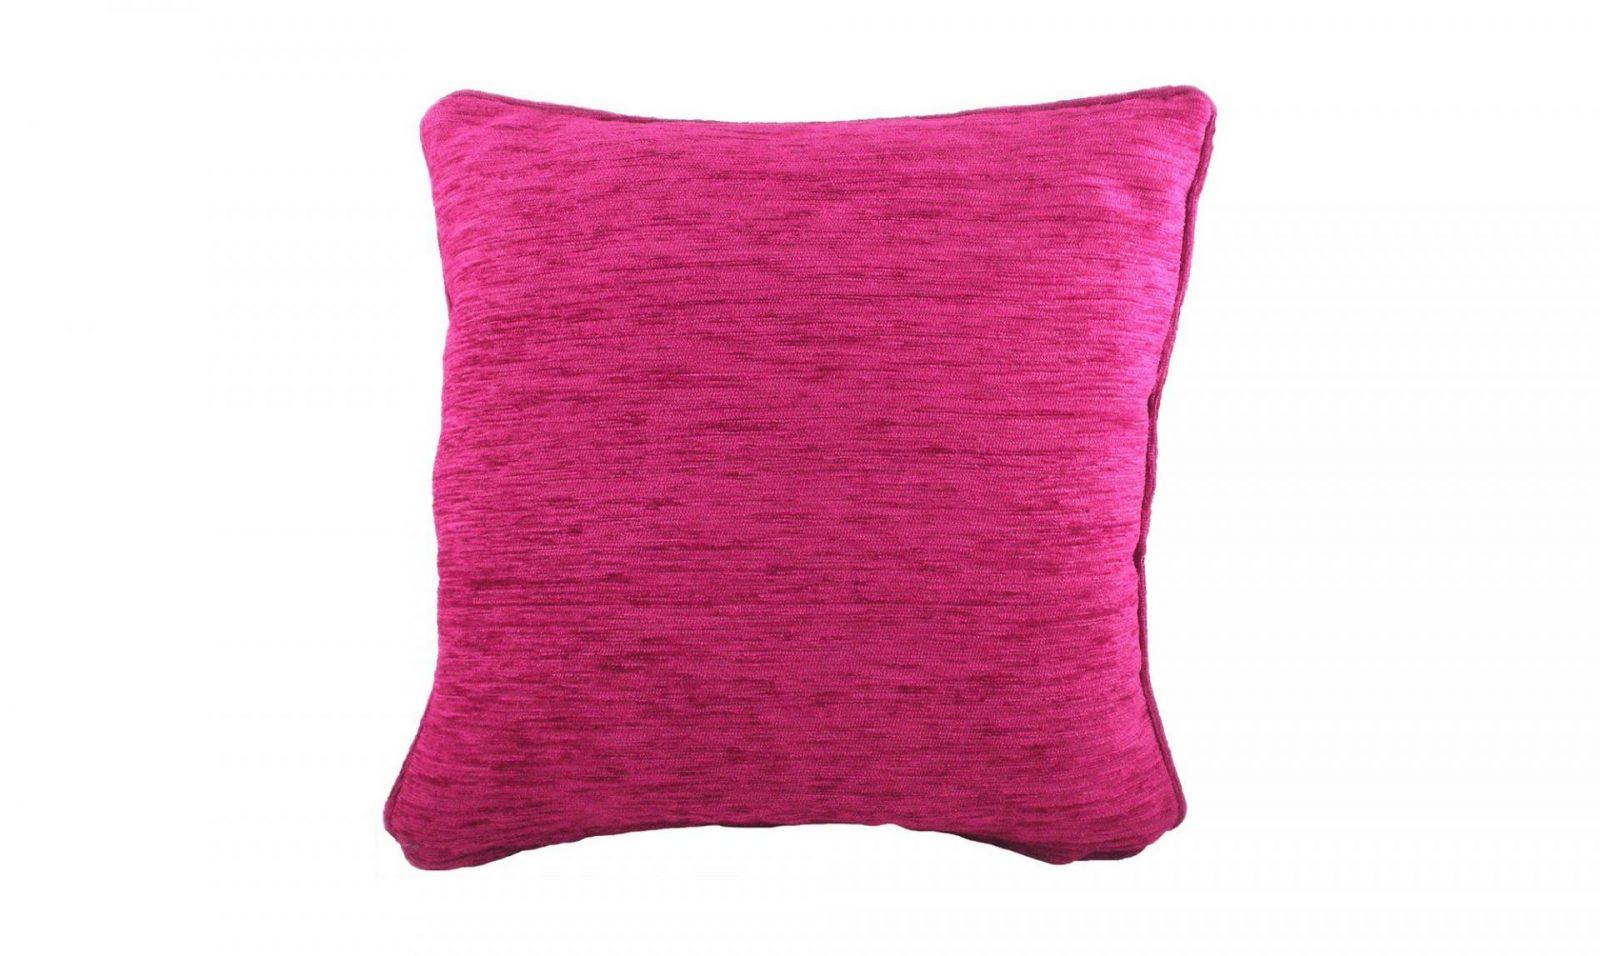 Savannah Cranberry cushion from Fishpools